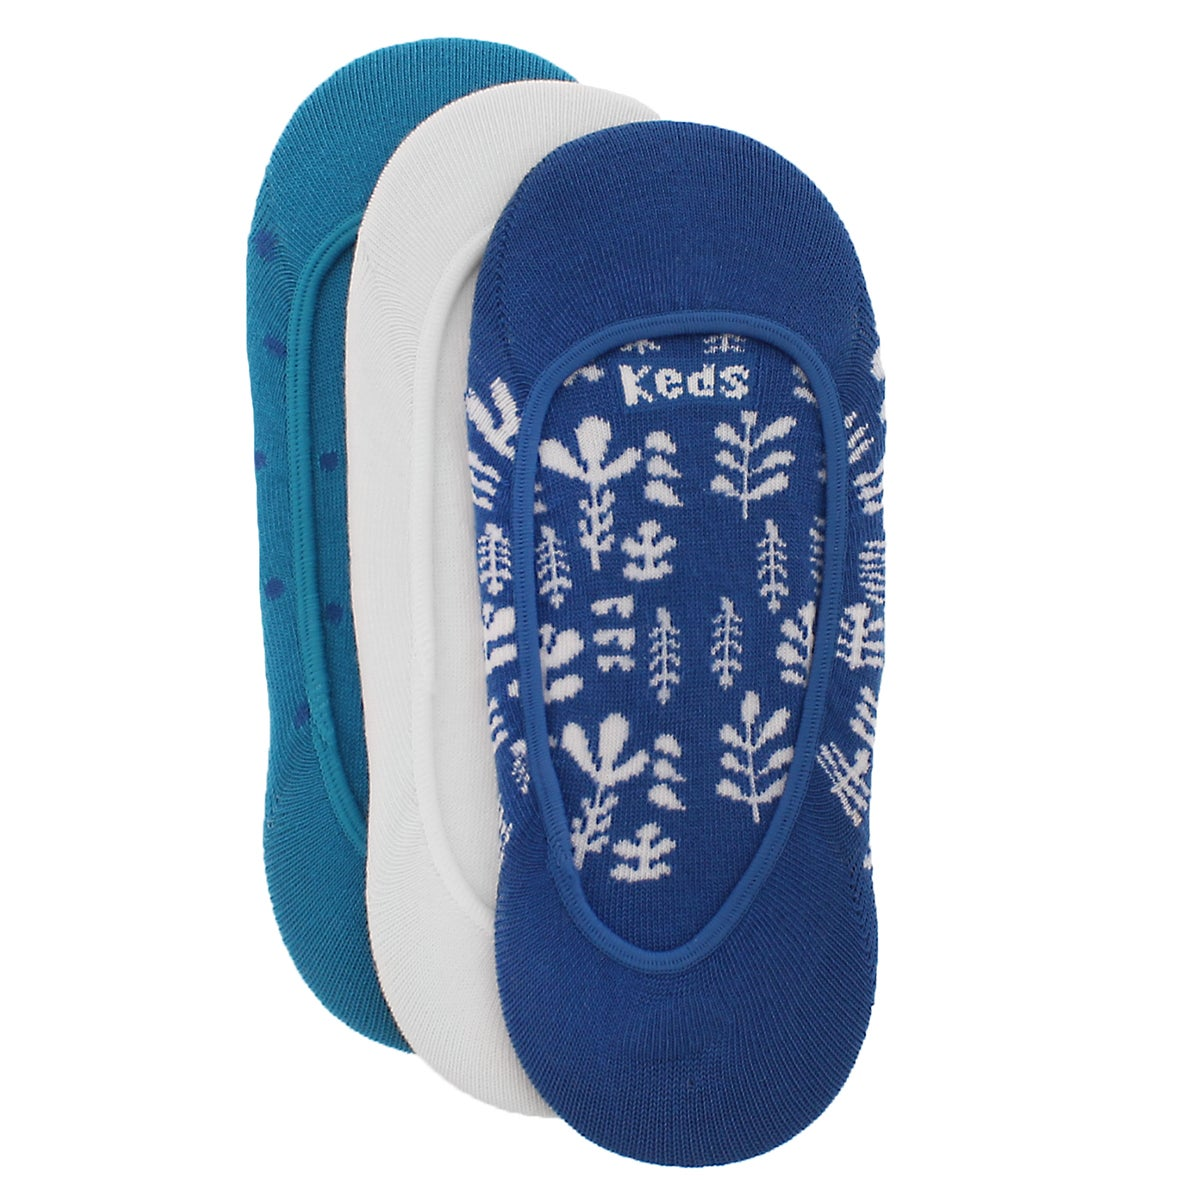 Women's JETSETTER blue floral multi liners- 3 pk